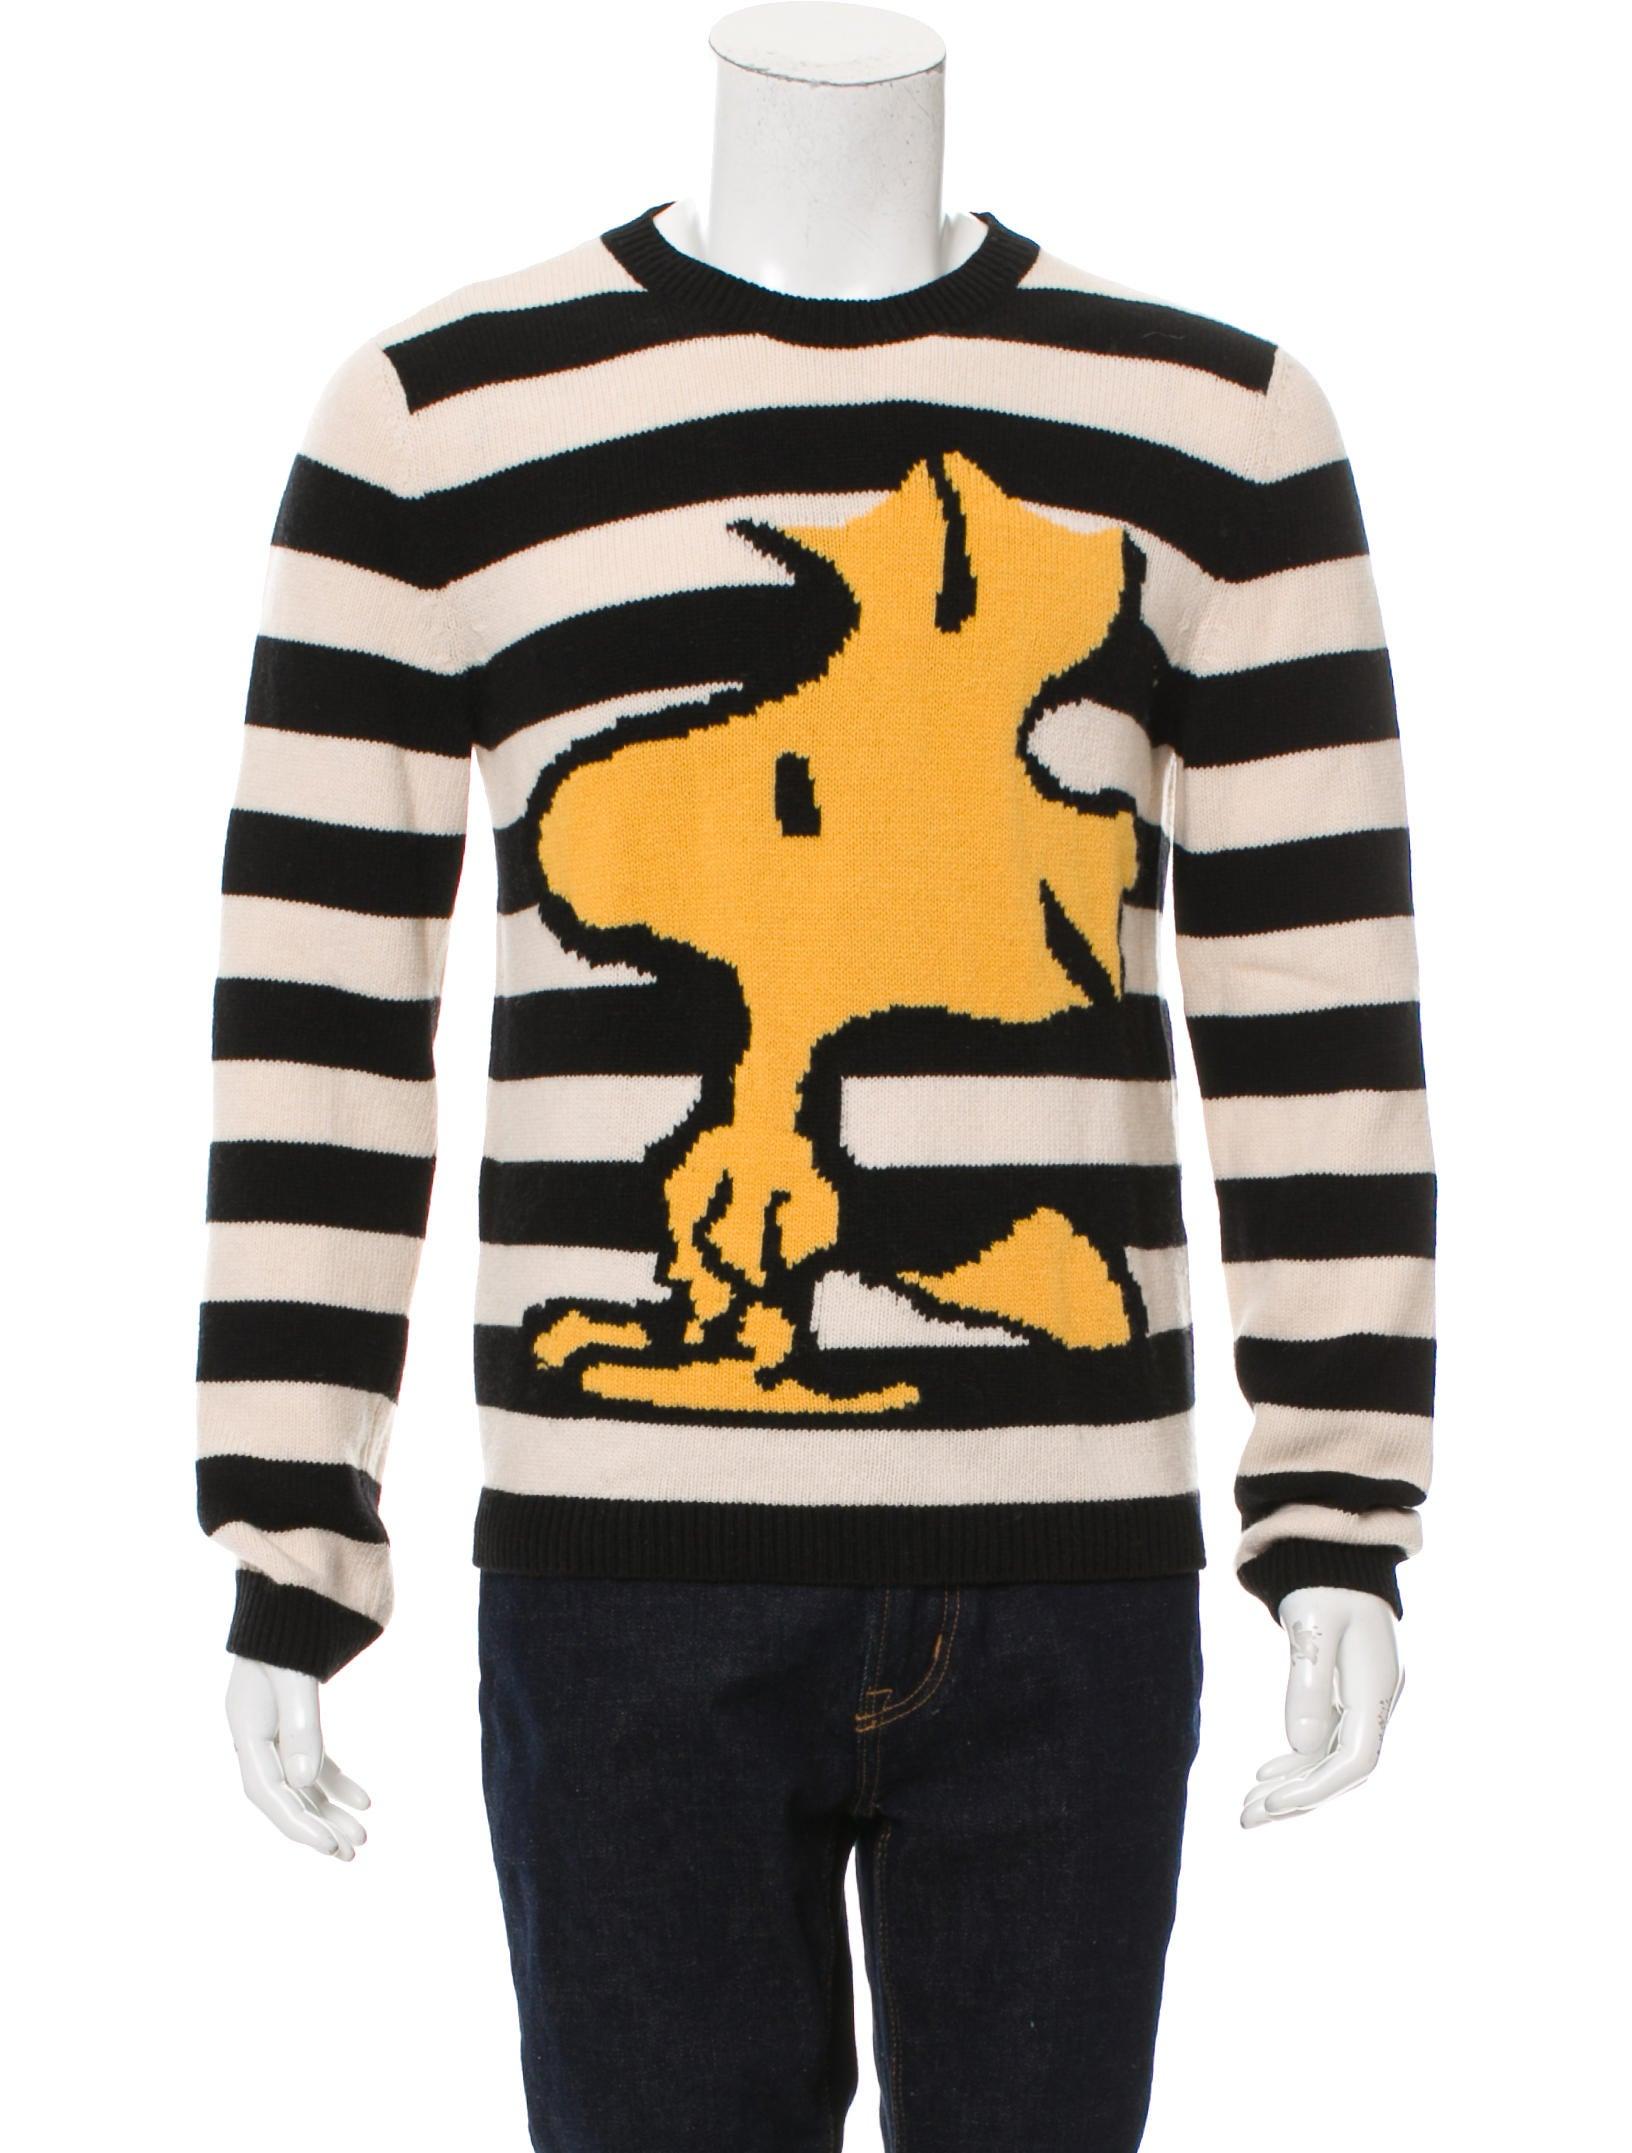 8fa2a72e705 Gucci Peanuts Wool Sweater - Clothing - GUC189633